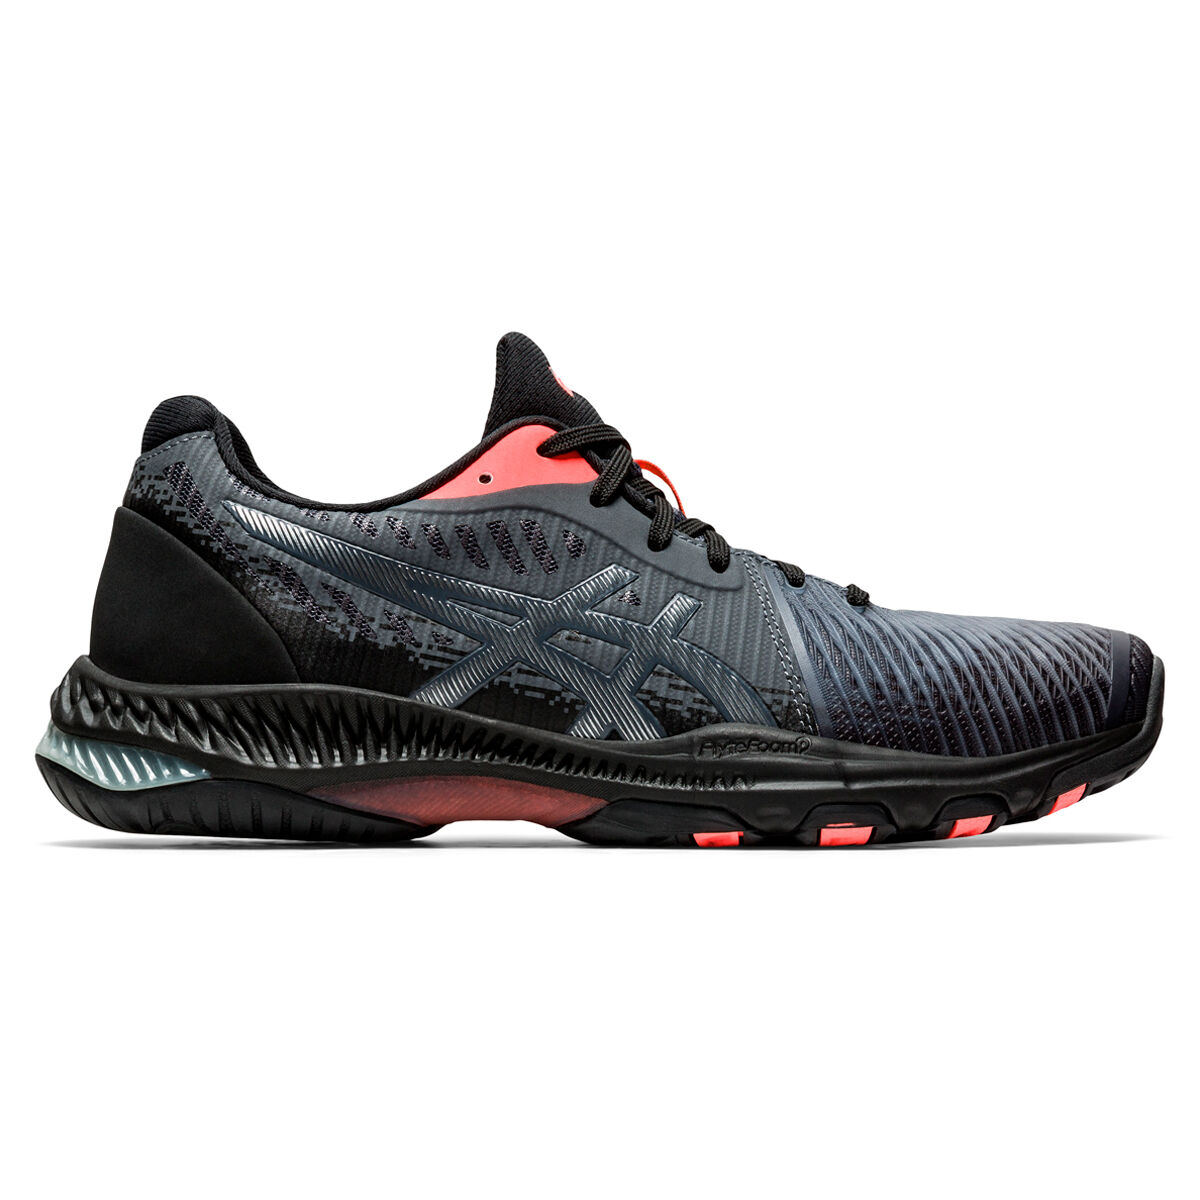 adidas originals la trainer weave black hair color | Asics Netburner Ballistic FF 2 Womens Netball Shoes